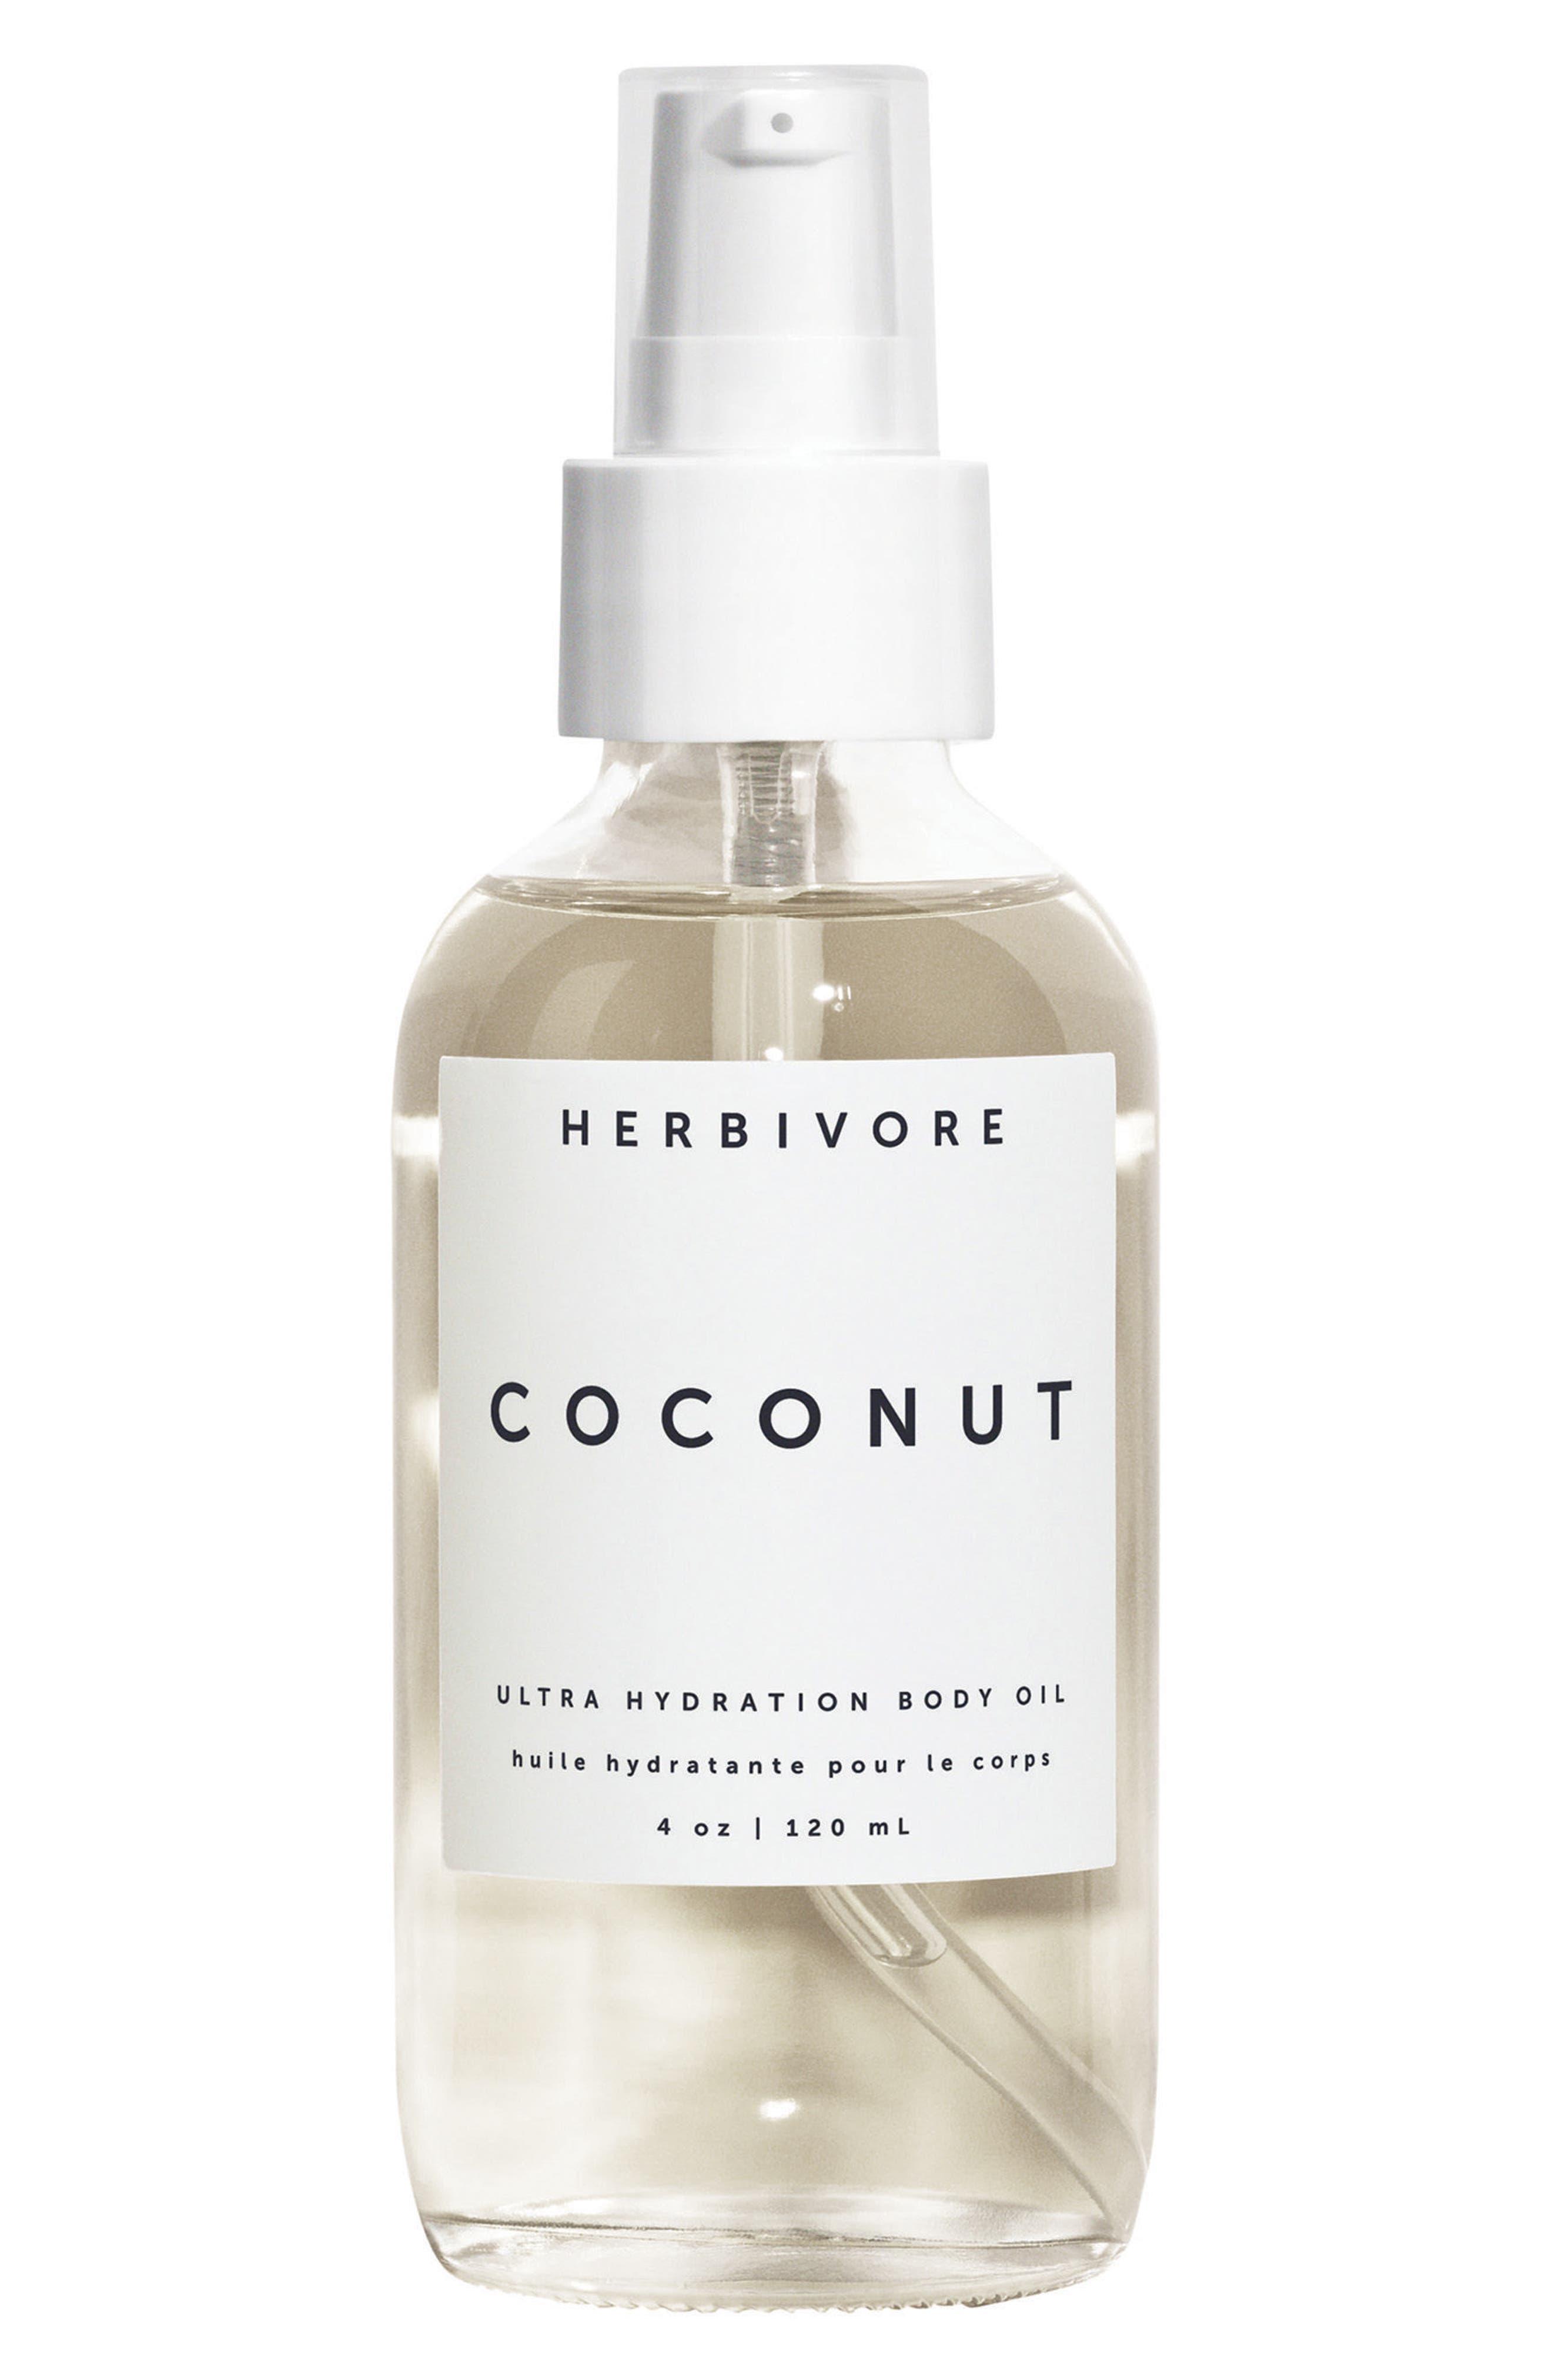 Coconut Ultra Hydration Body Oil